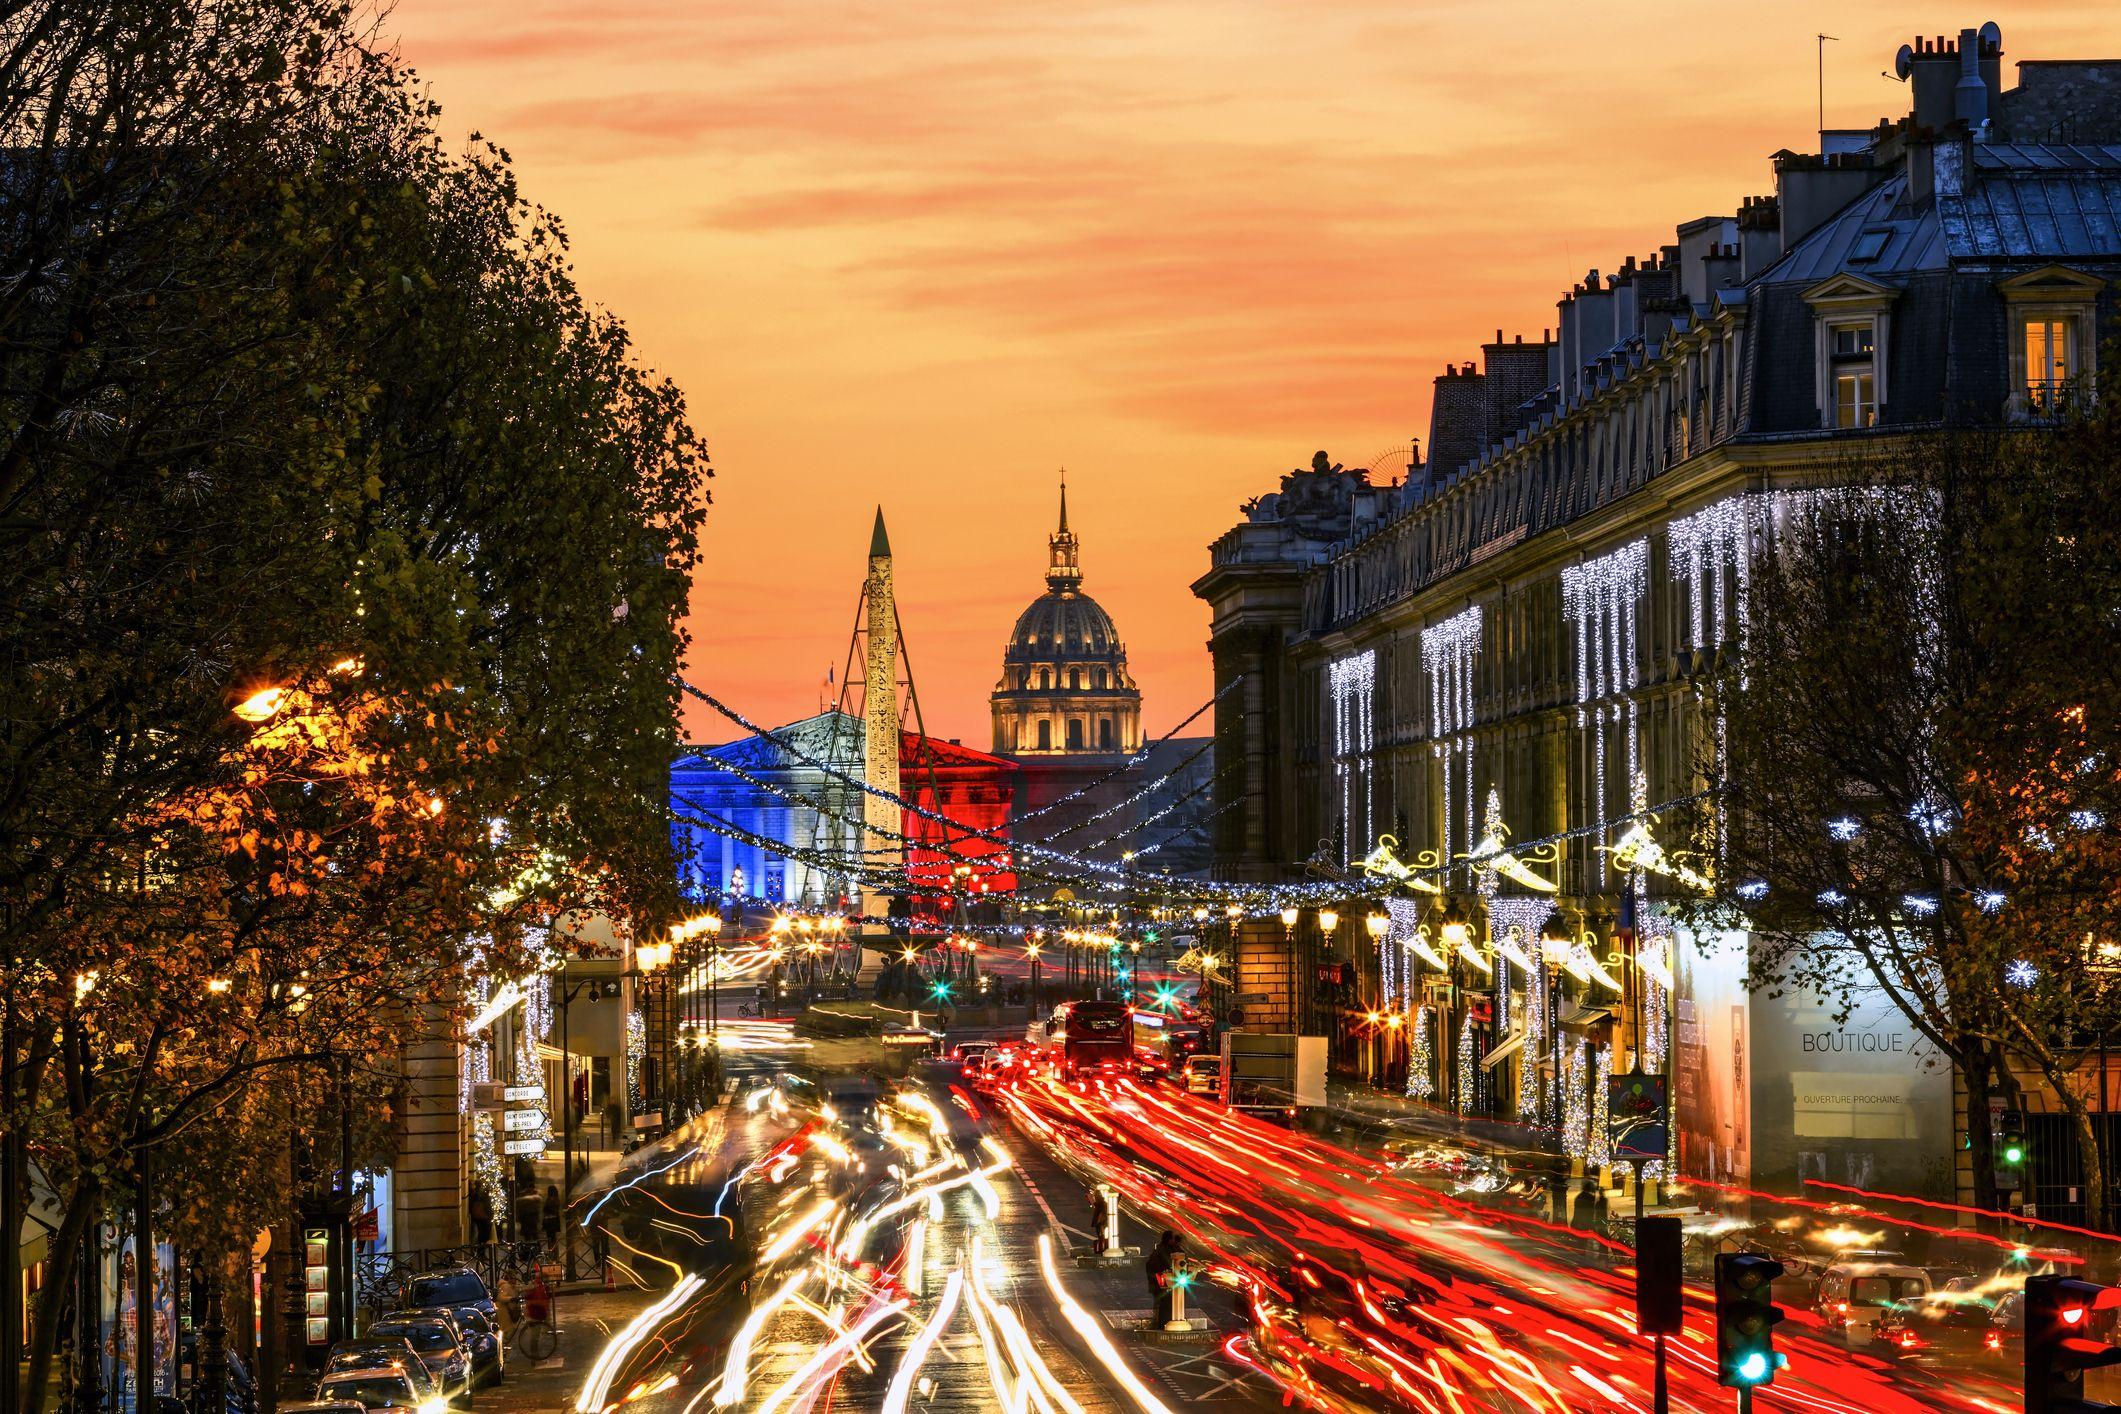 11 Reasons Paris Is a Magical Wonderland During the Christmas Season